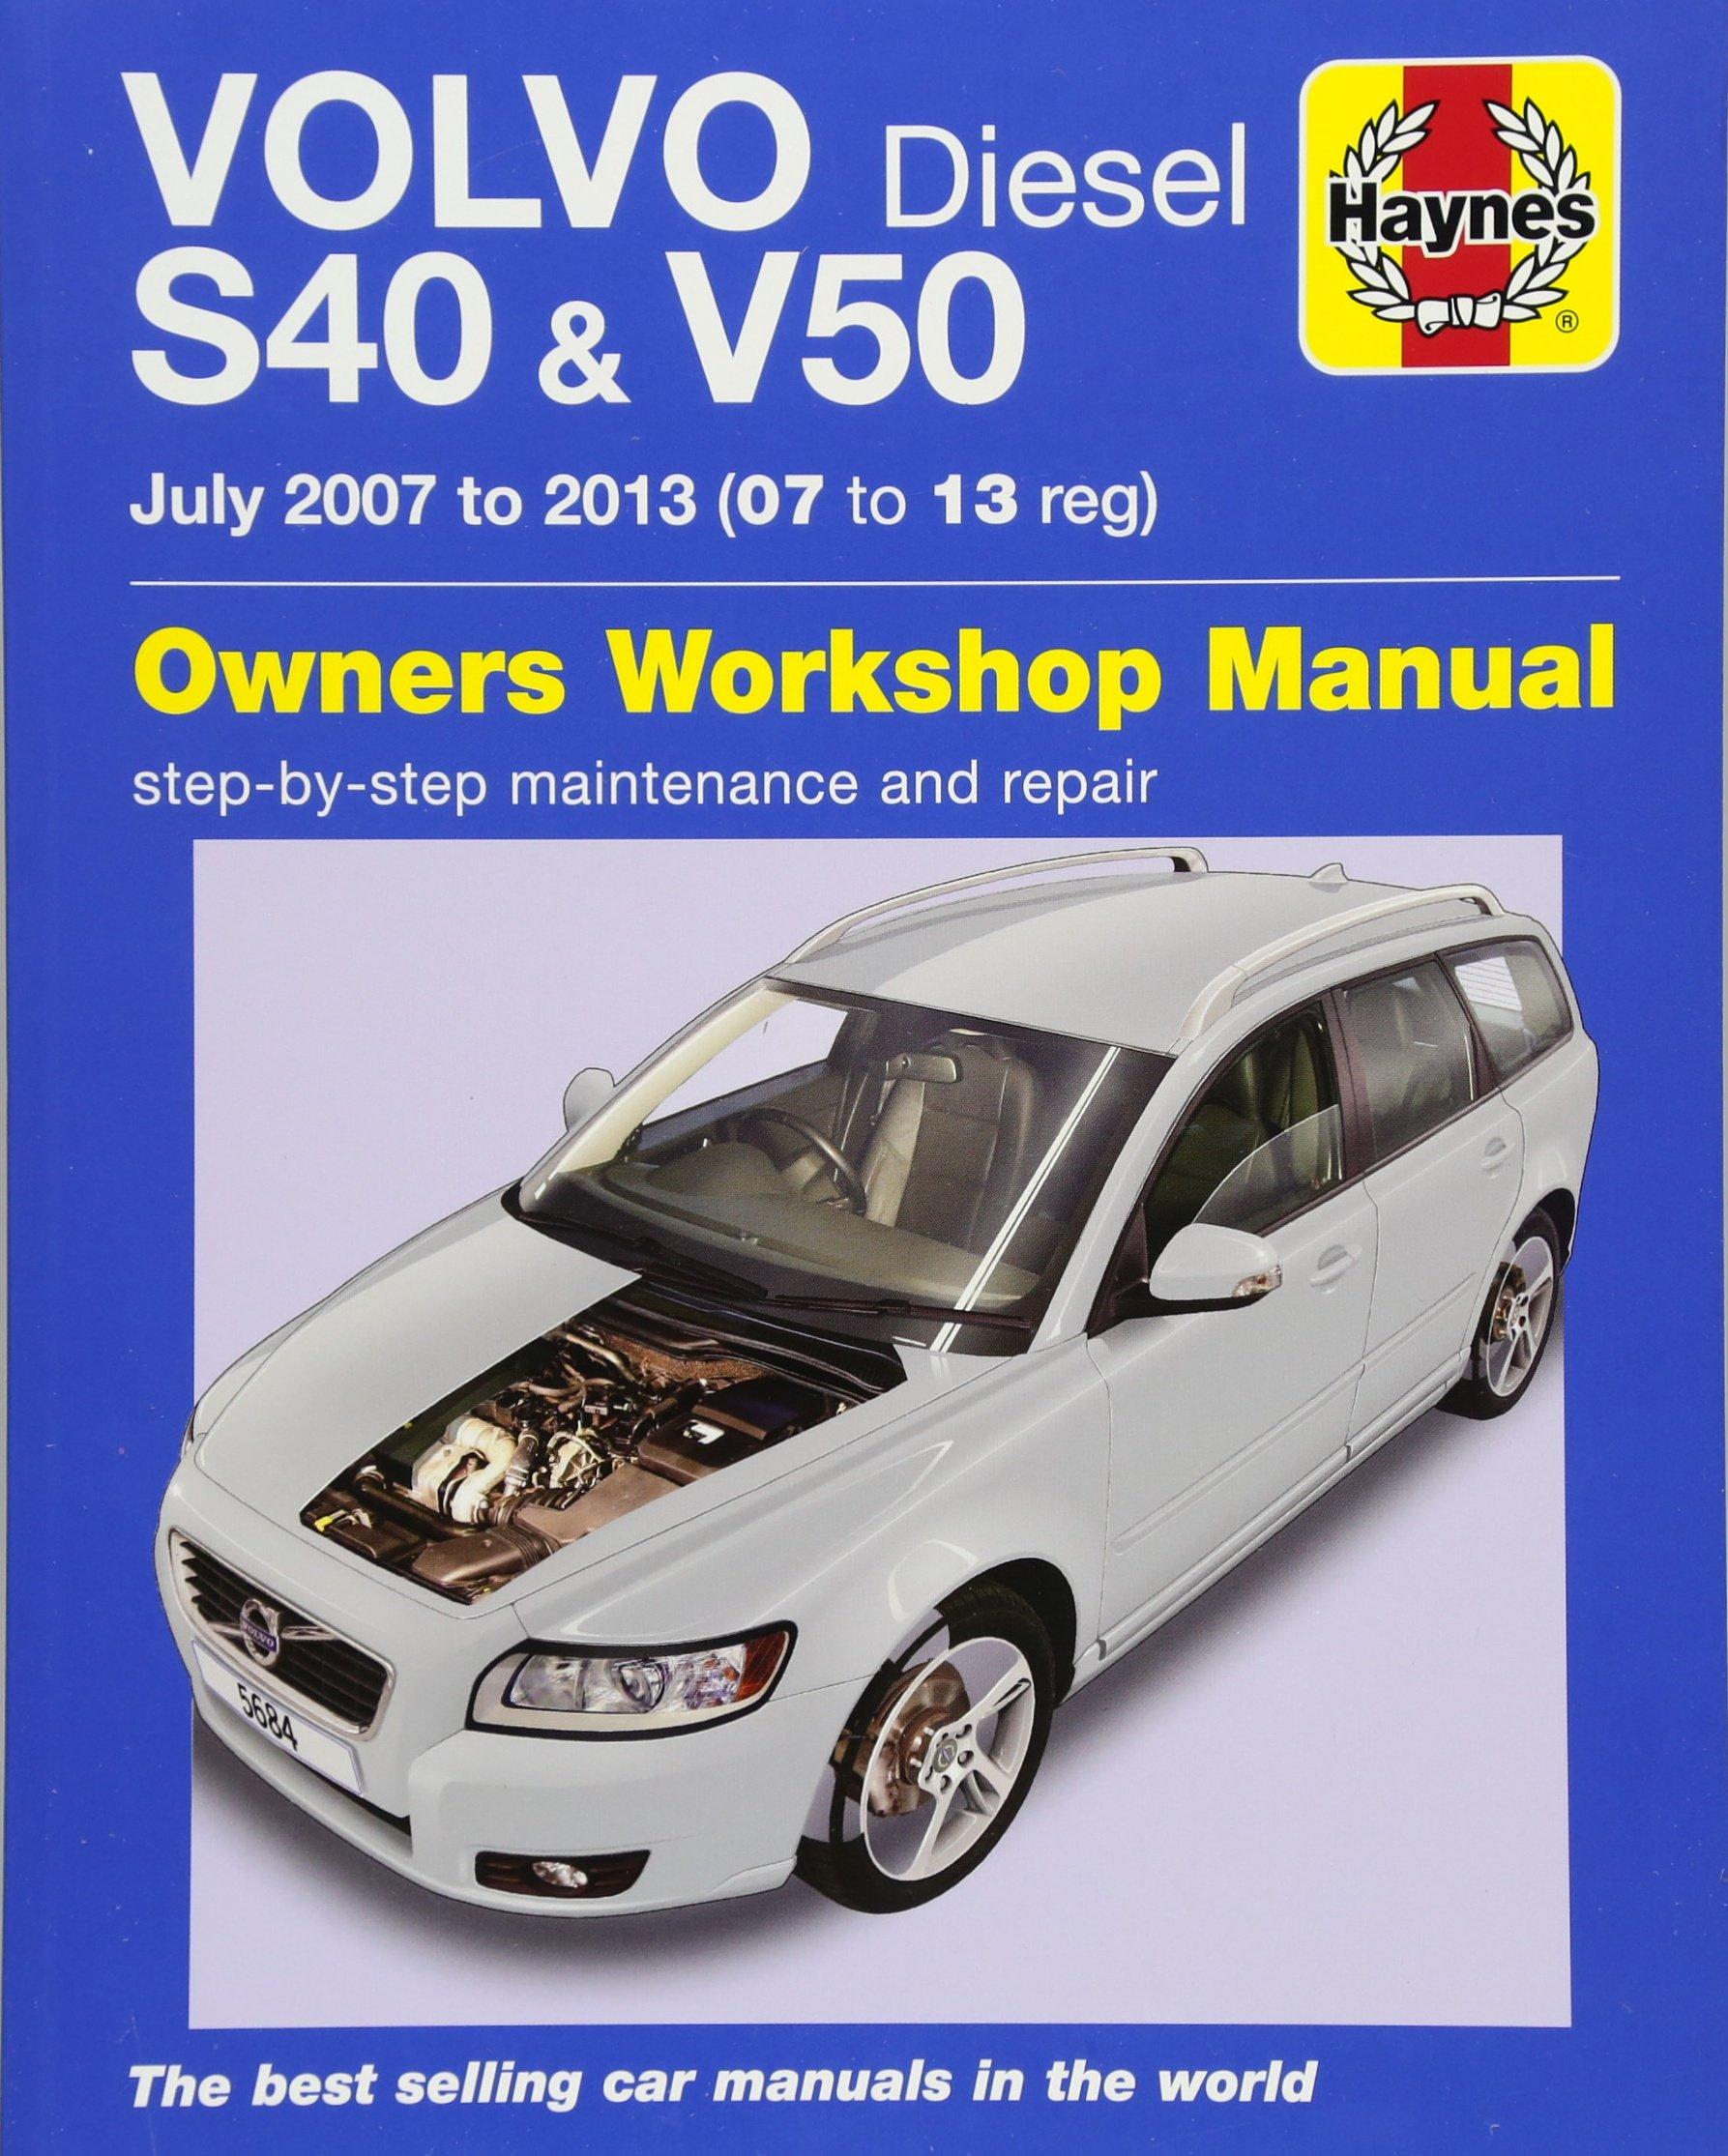 Volvo S40 & V50 Diesel Owners Workshop Manual: 2007-13: Chris Randall:  9781785213786: Amazon.com: Books